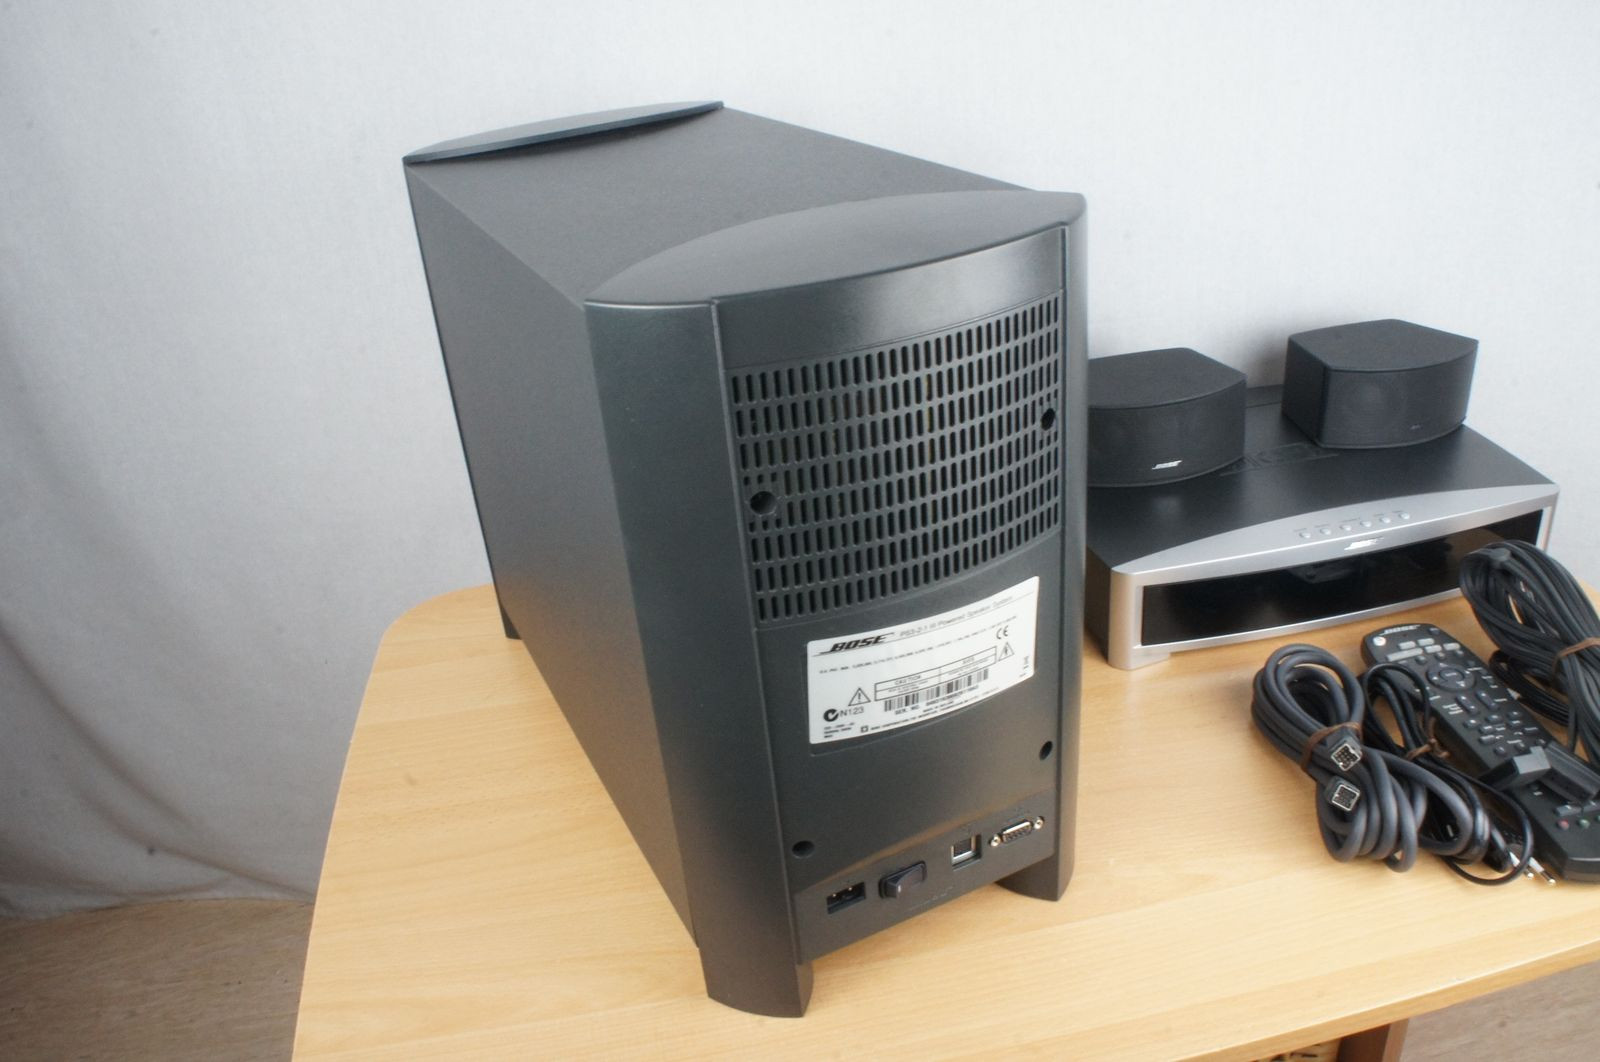 bose 321 3 2 1 gs series iii home cinema sistema con hdmi. Black Bedroom Furniture Sets. Home Design Ideas